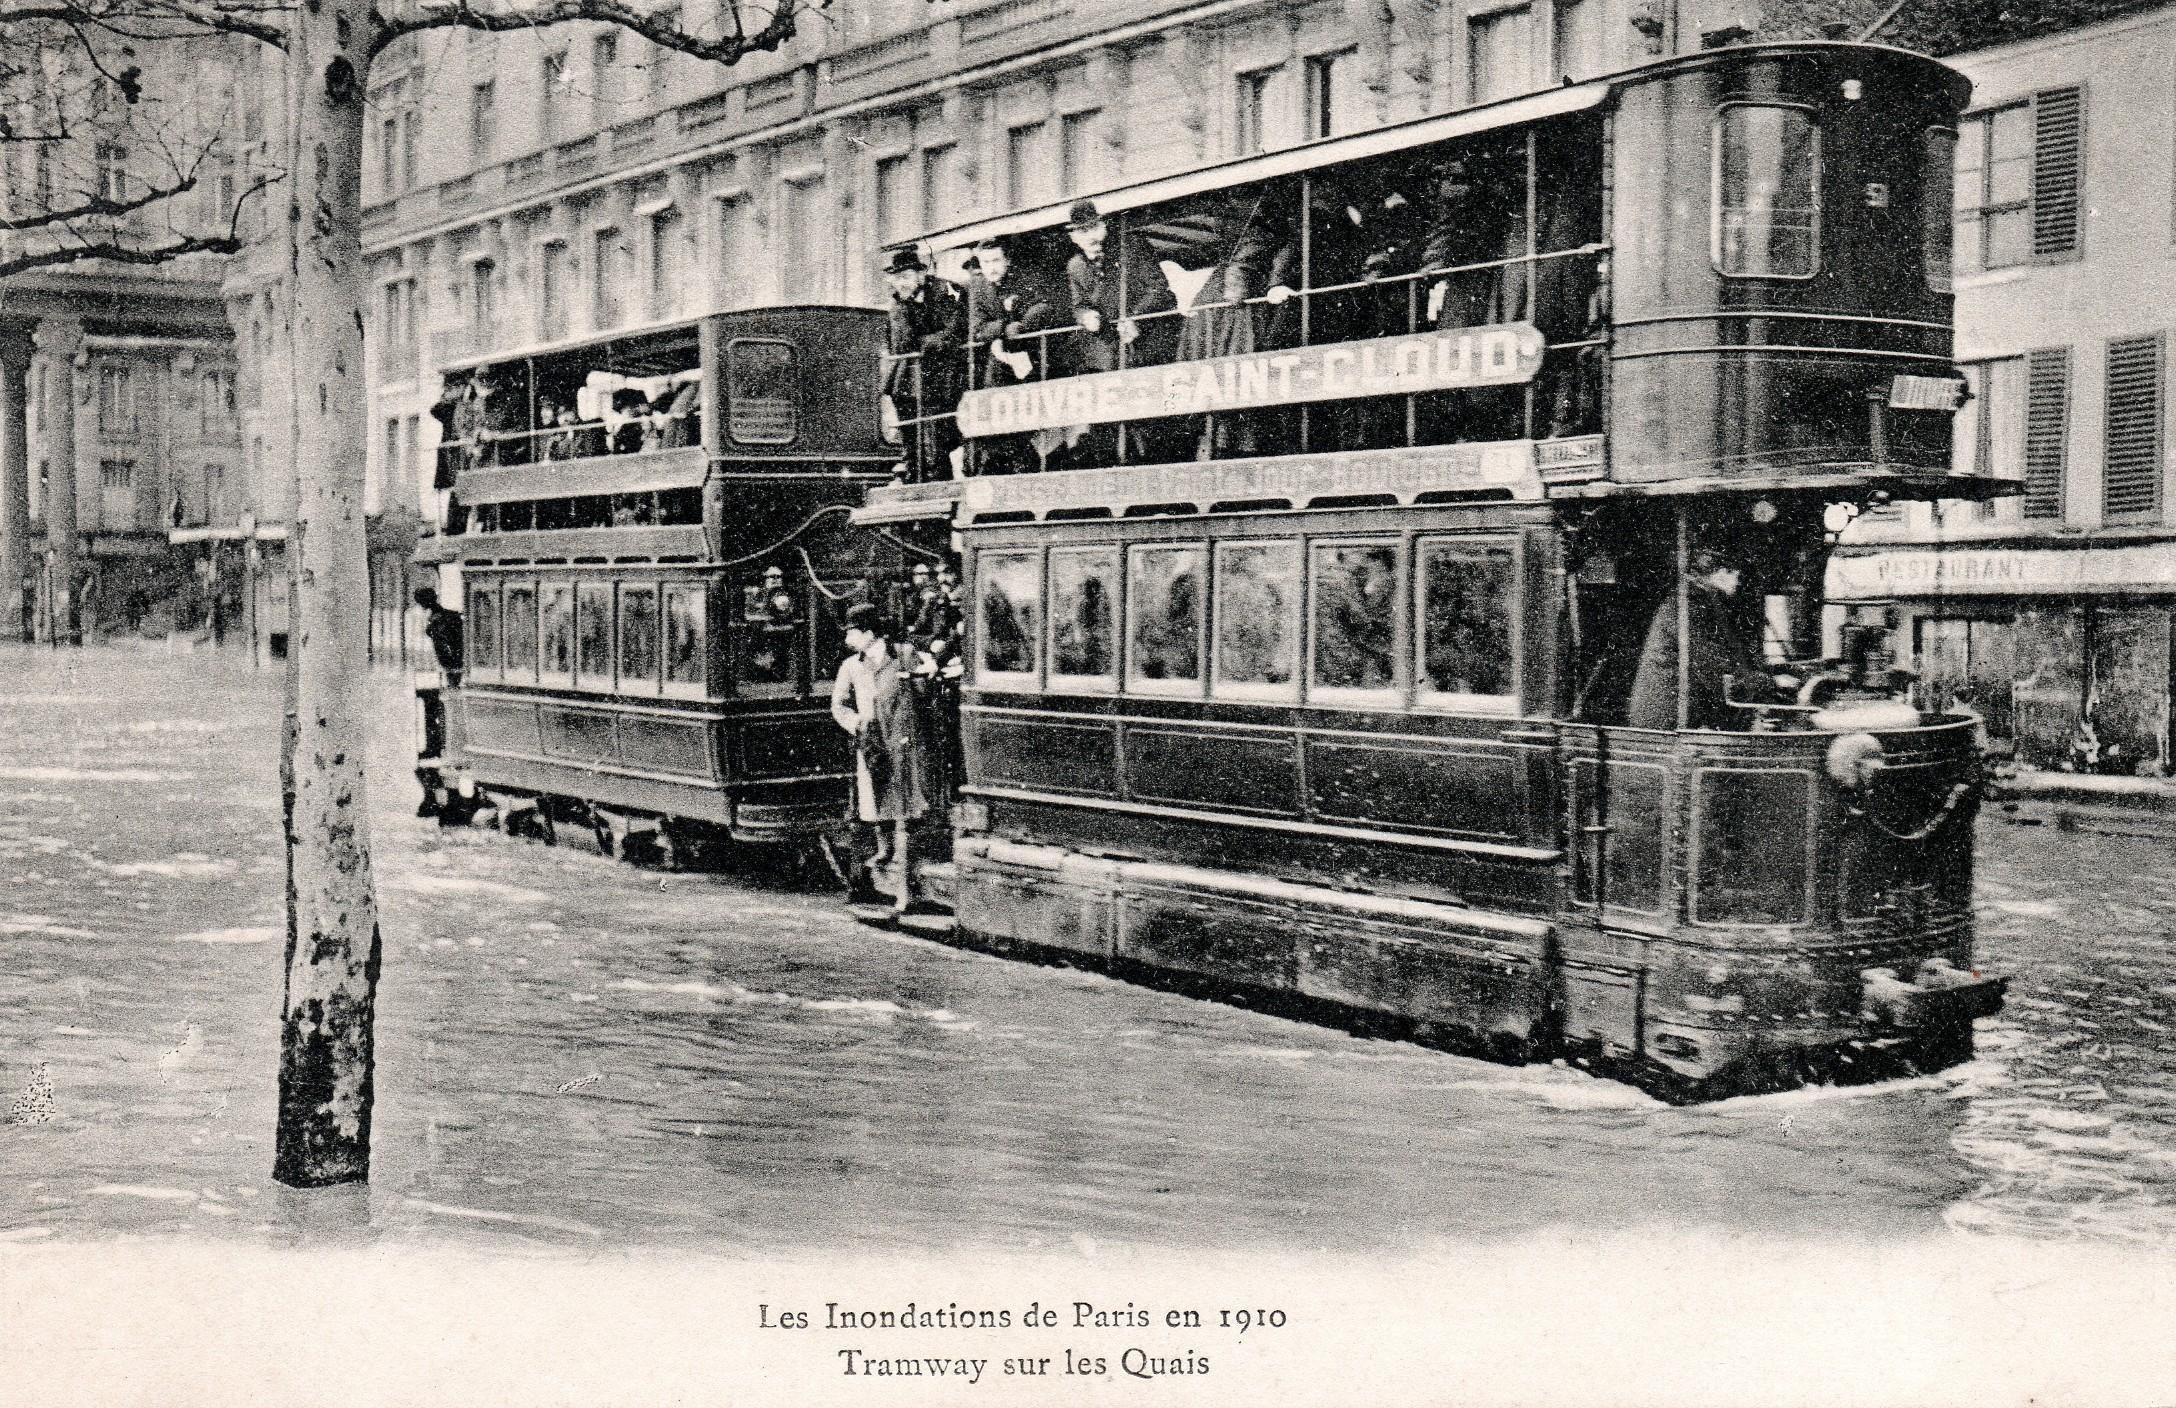 http://upload.wikimedia.org/wikipedia/commons/0/04/Tramway_M%C3%A9karski_Paris_1910_inondations.JPG